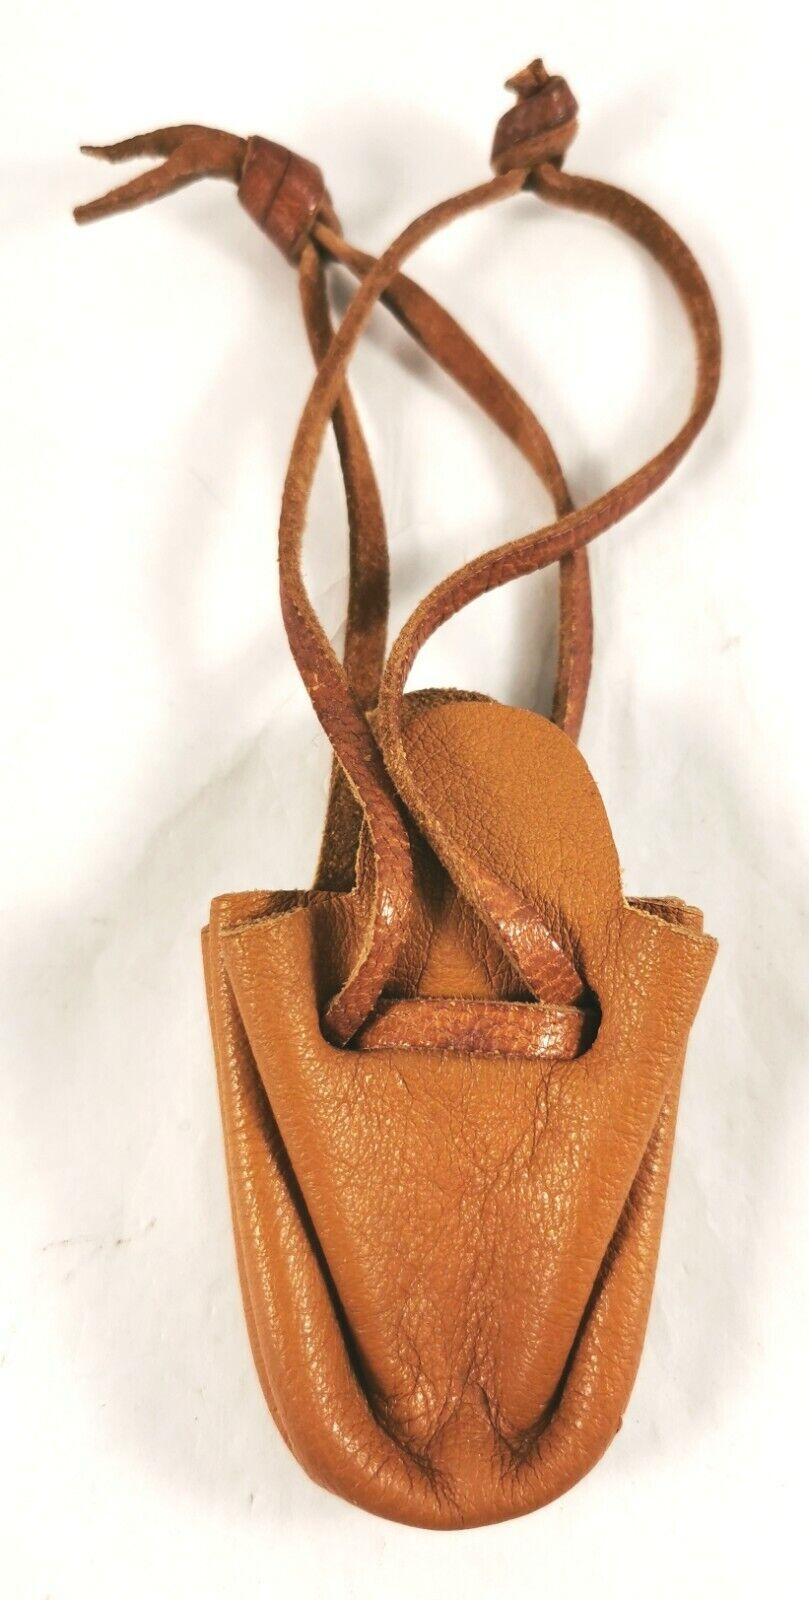 Leather Purse Case Coin Key Holder Mini Handmade Pocket Wallet Art